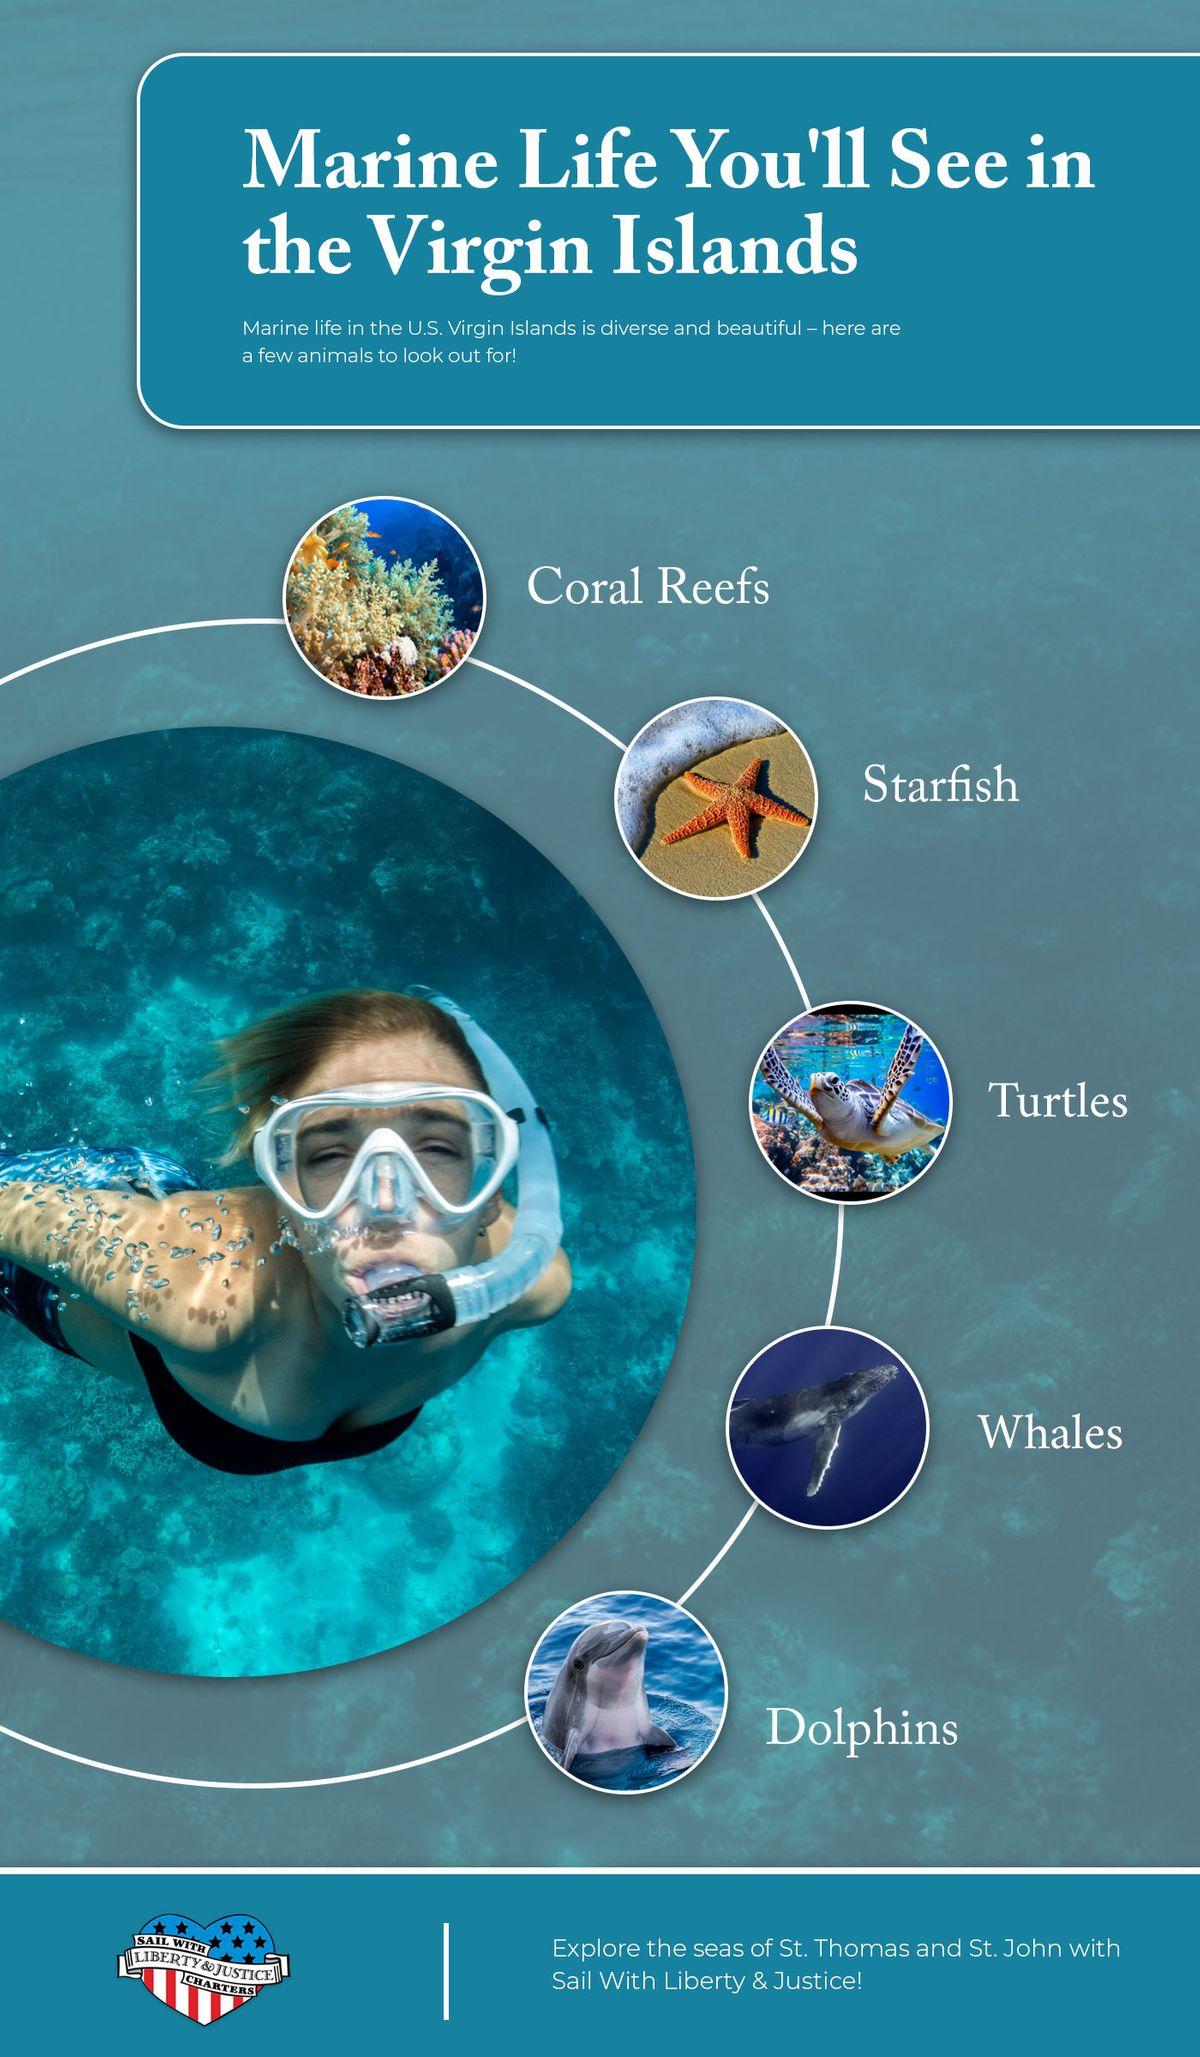 Marine Life You'll See in the Virgin Islands.jpg